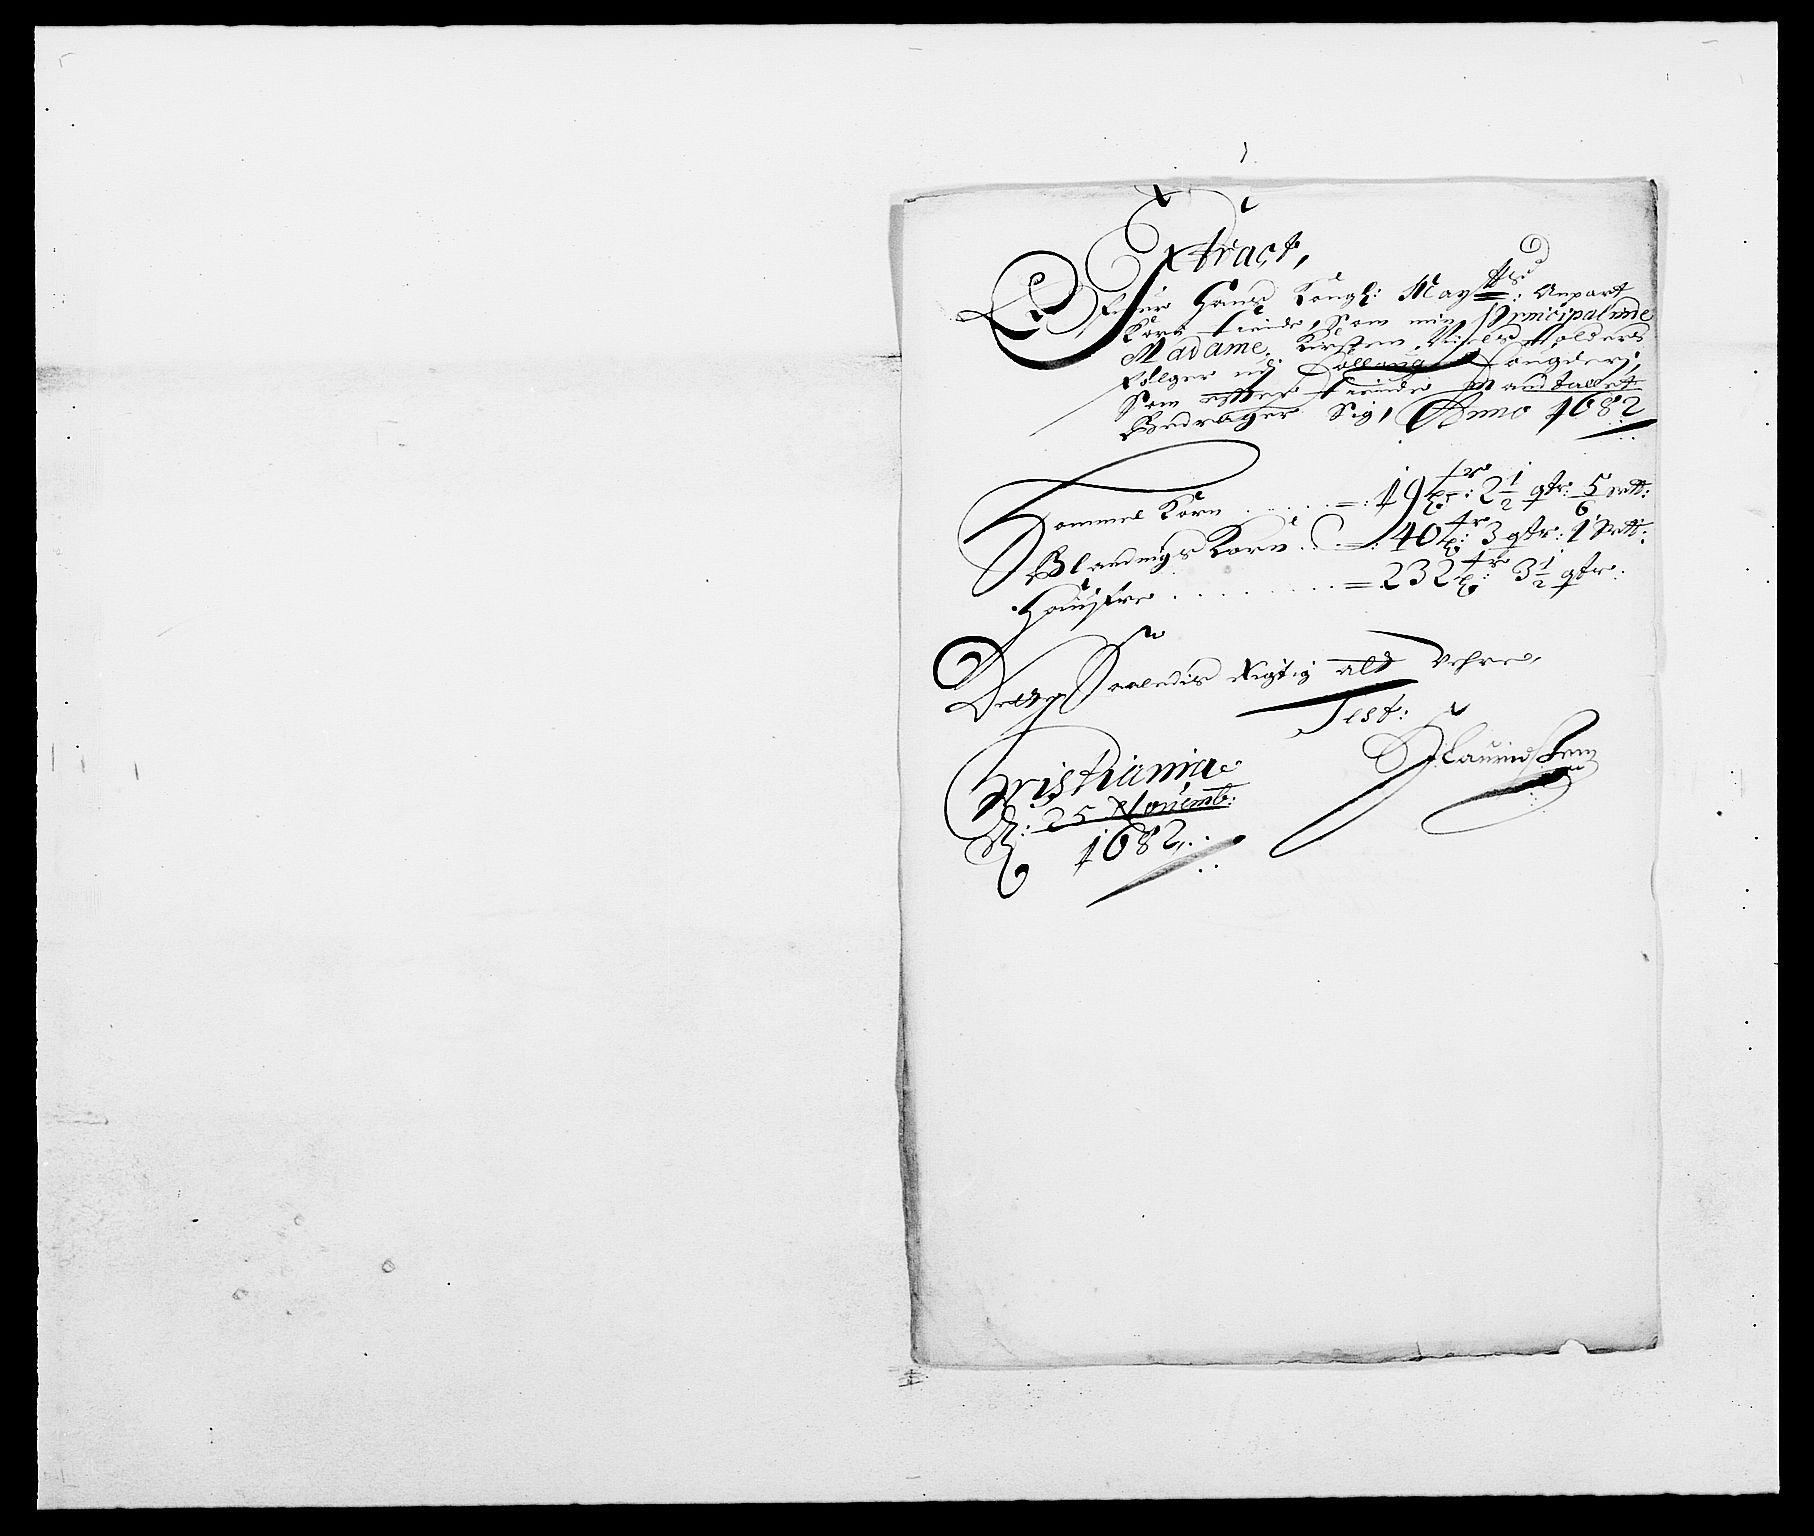 RA, Rentekammeret inntil 1814, Reviderte regnskaper, Fogderegnskap, R09/L0430: Fogderegnskap Follo, 1682-1683, s. 178